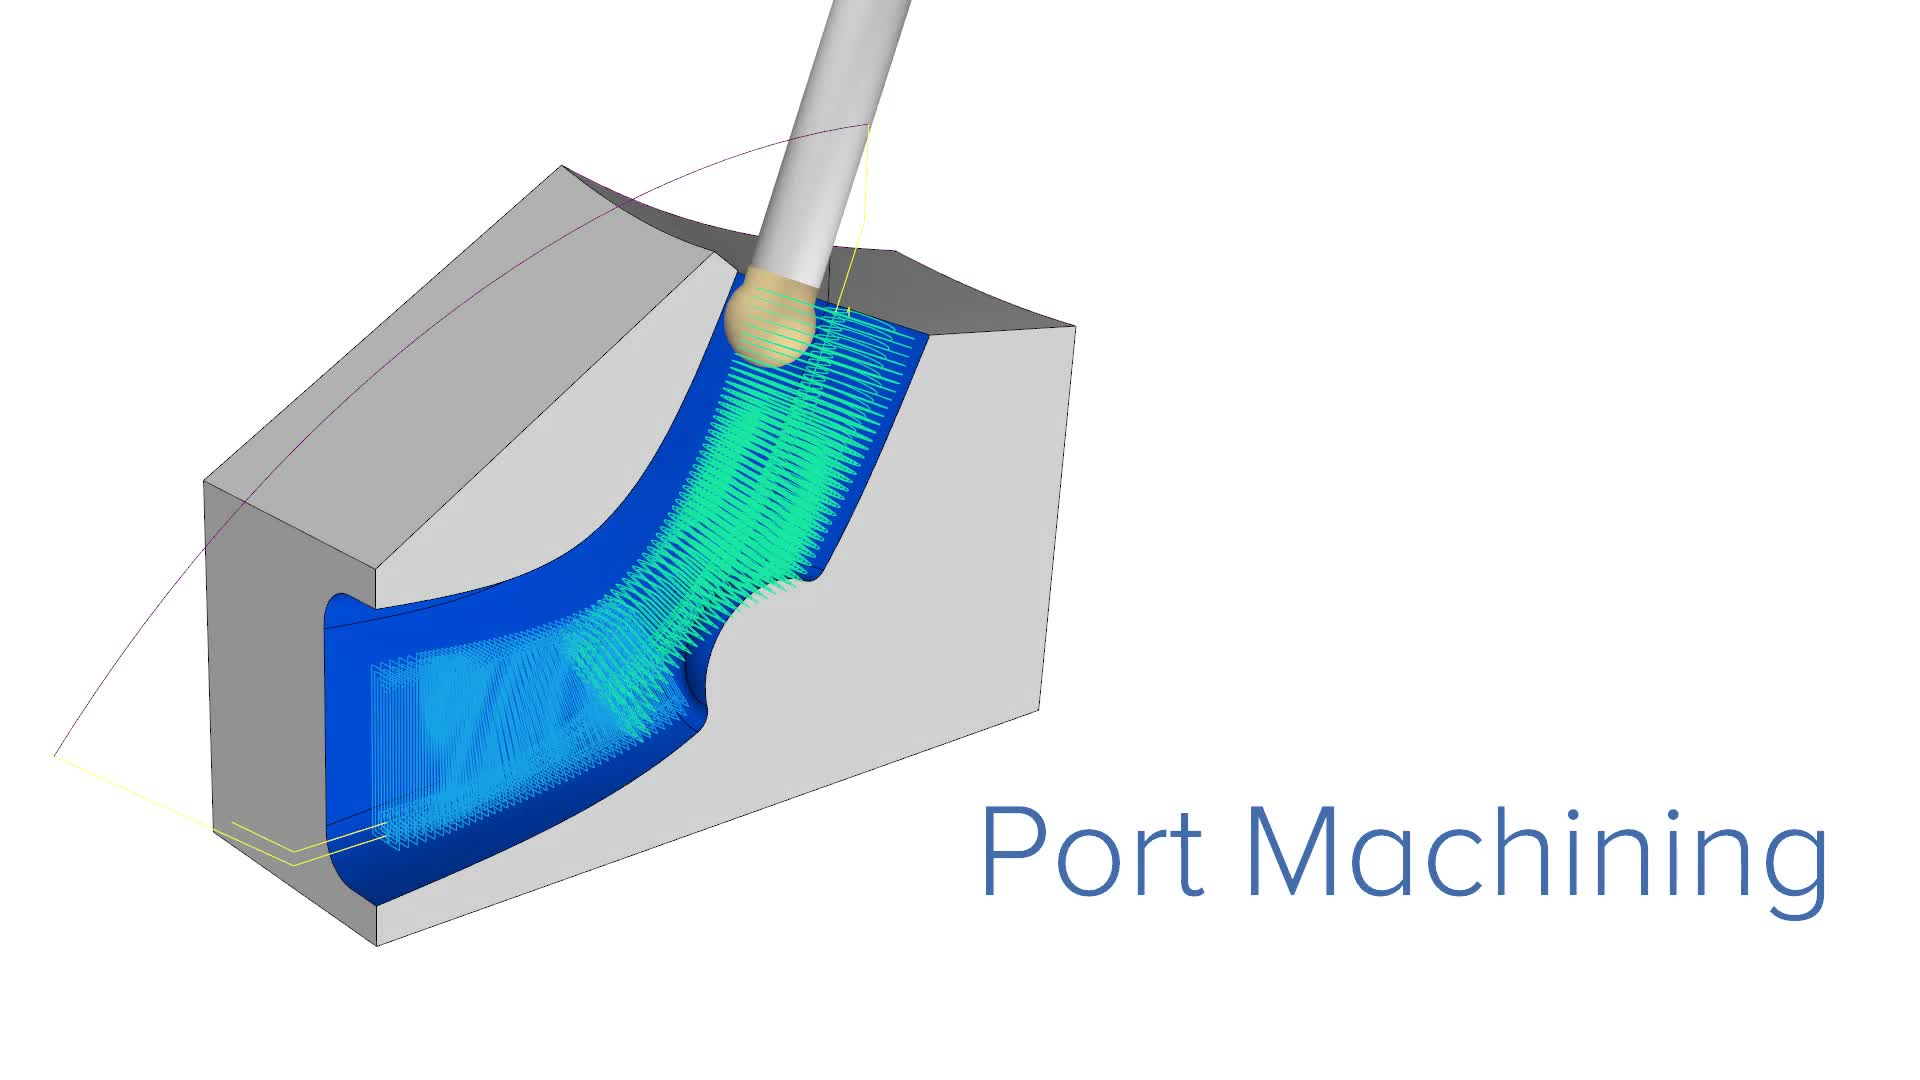 Port Machining